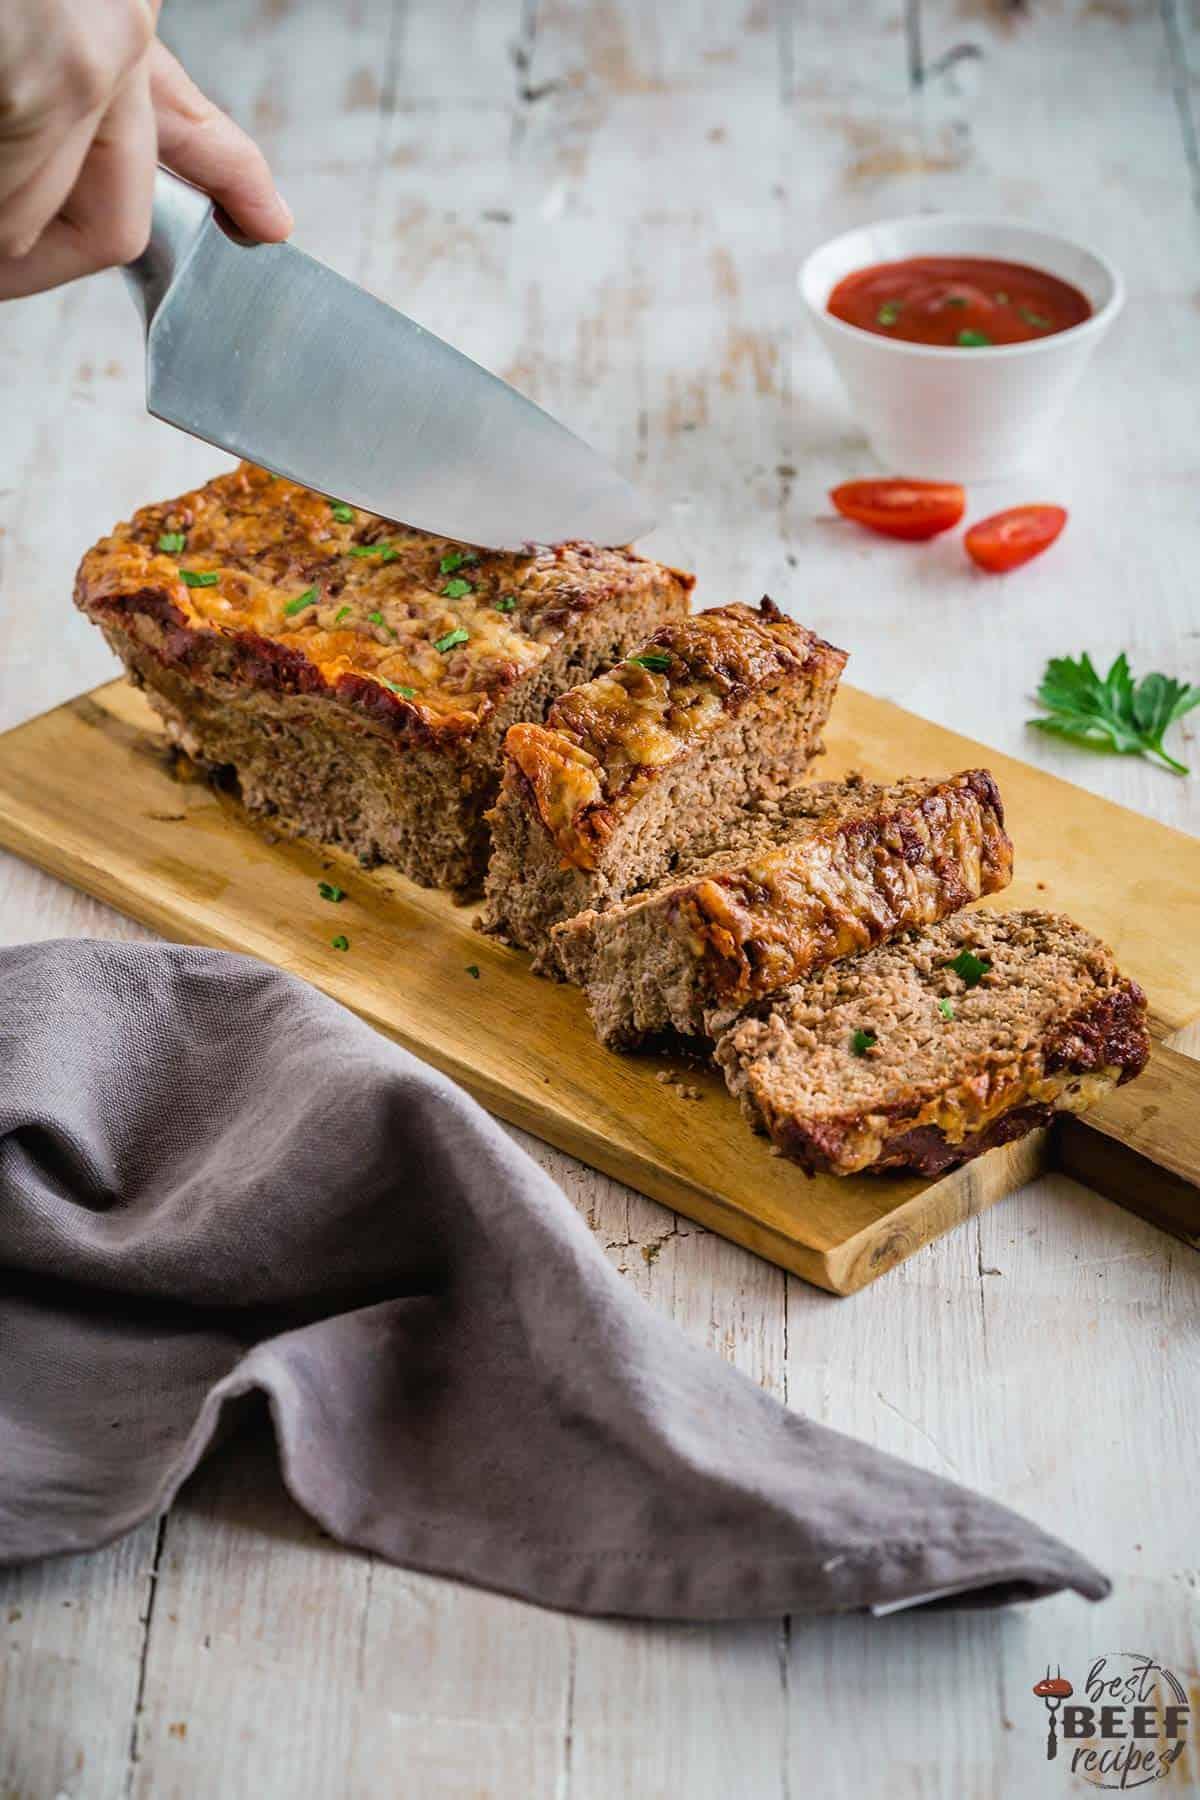 Slicing meatloaf with a knife